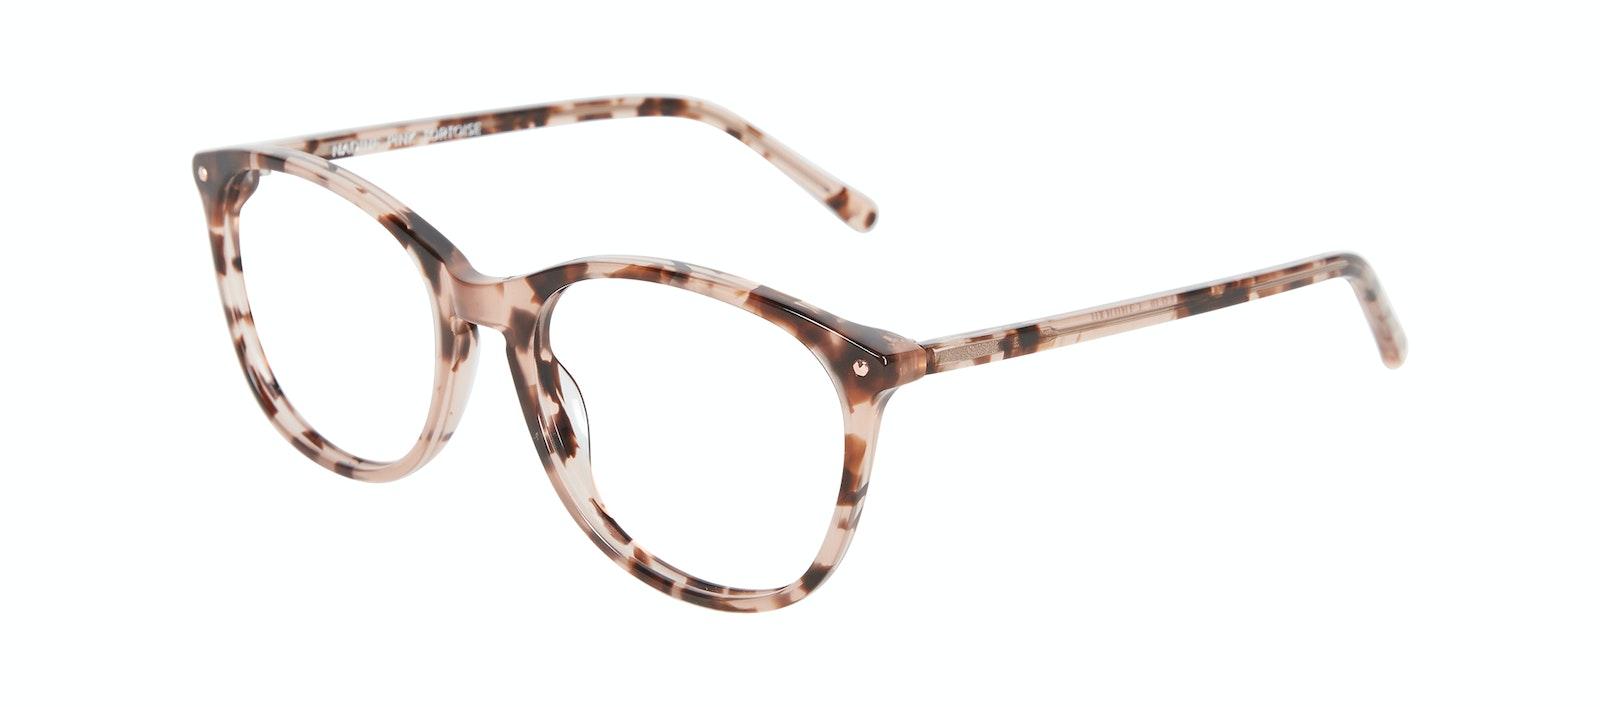 Affordable Fashion Glasses Rectangle Square Round Eyeglasses Women Nadine Pink Tortoise Tilt